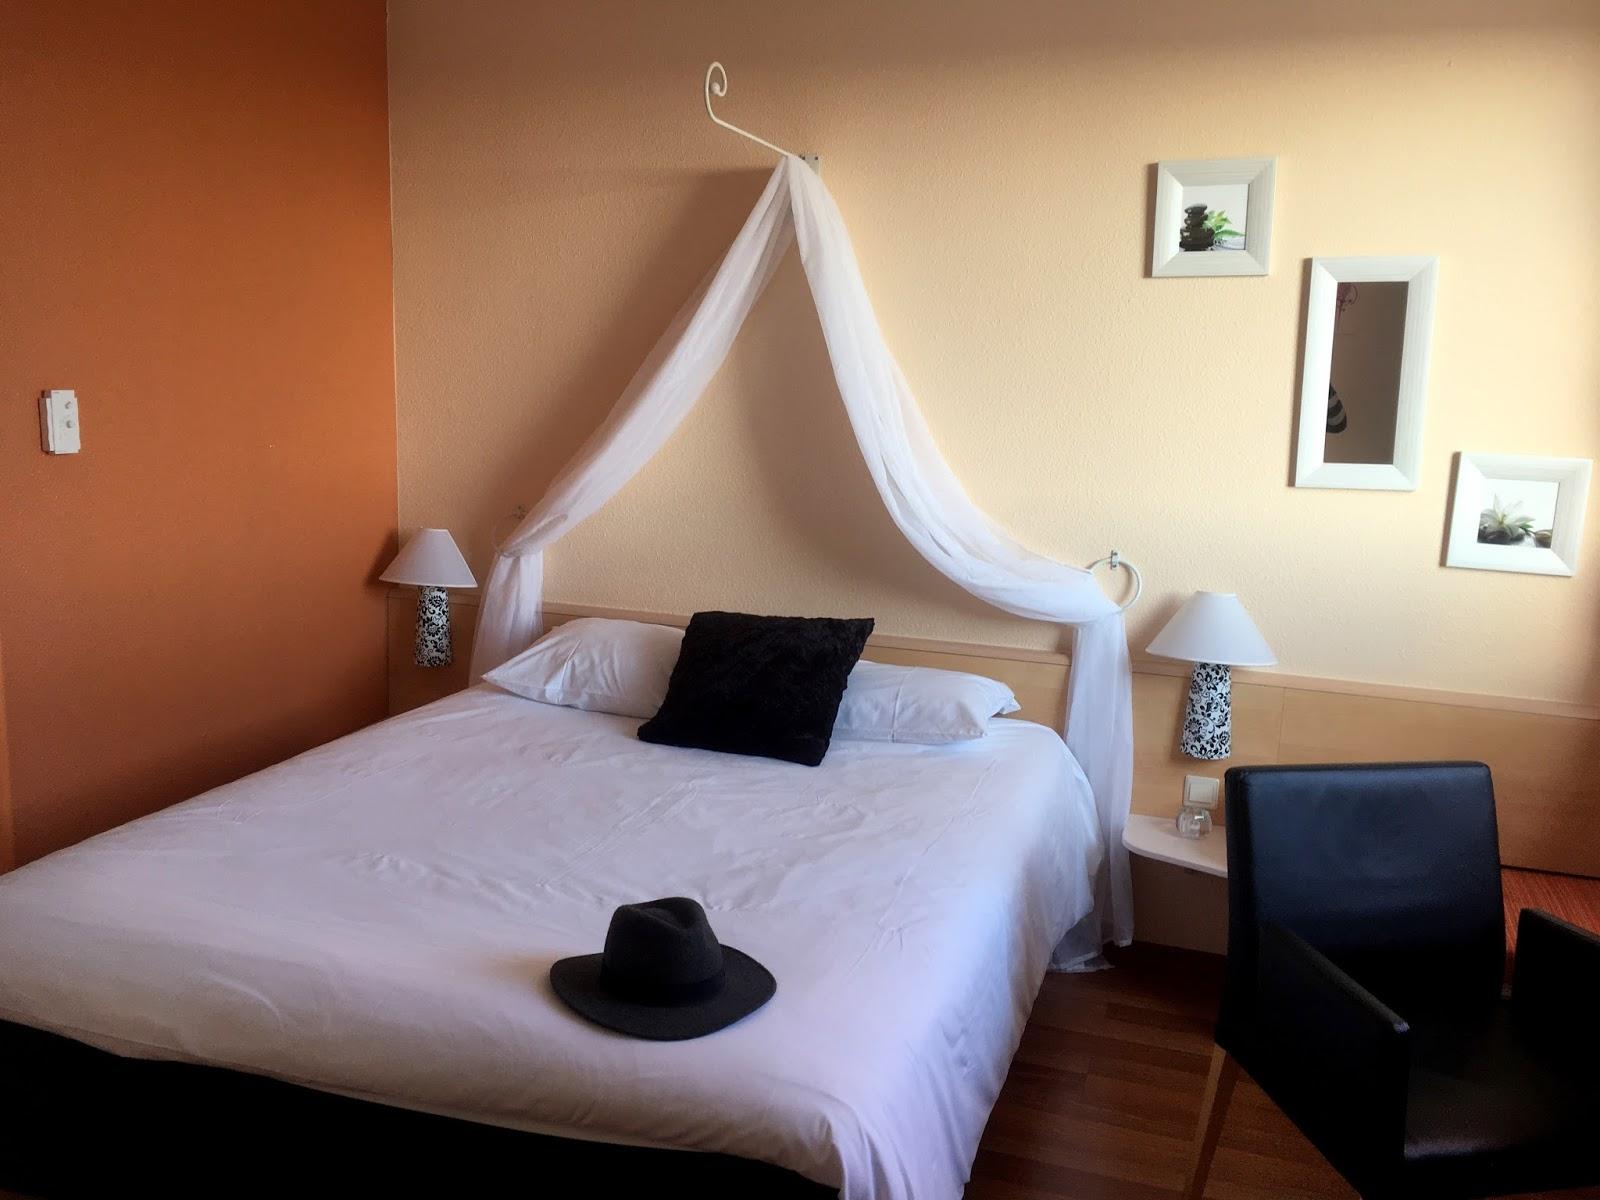 Übernachtungs-Tipp Berlin: Ibis Hotel am Ostbahnhof | The ...